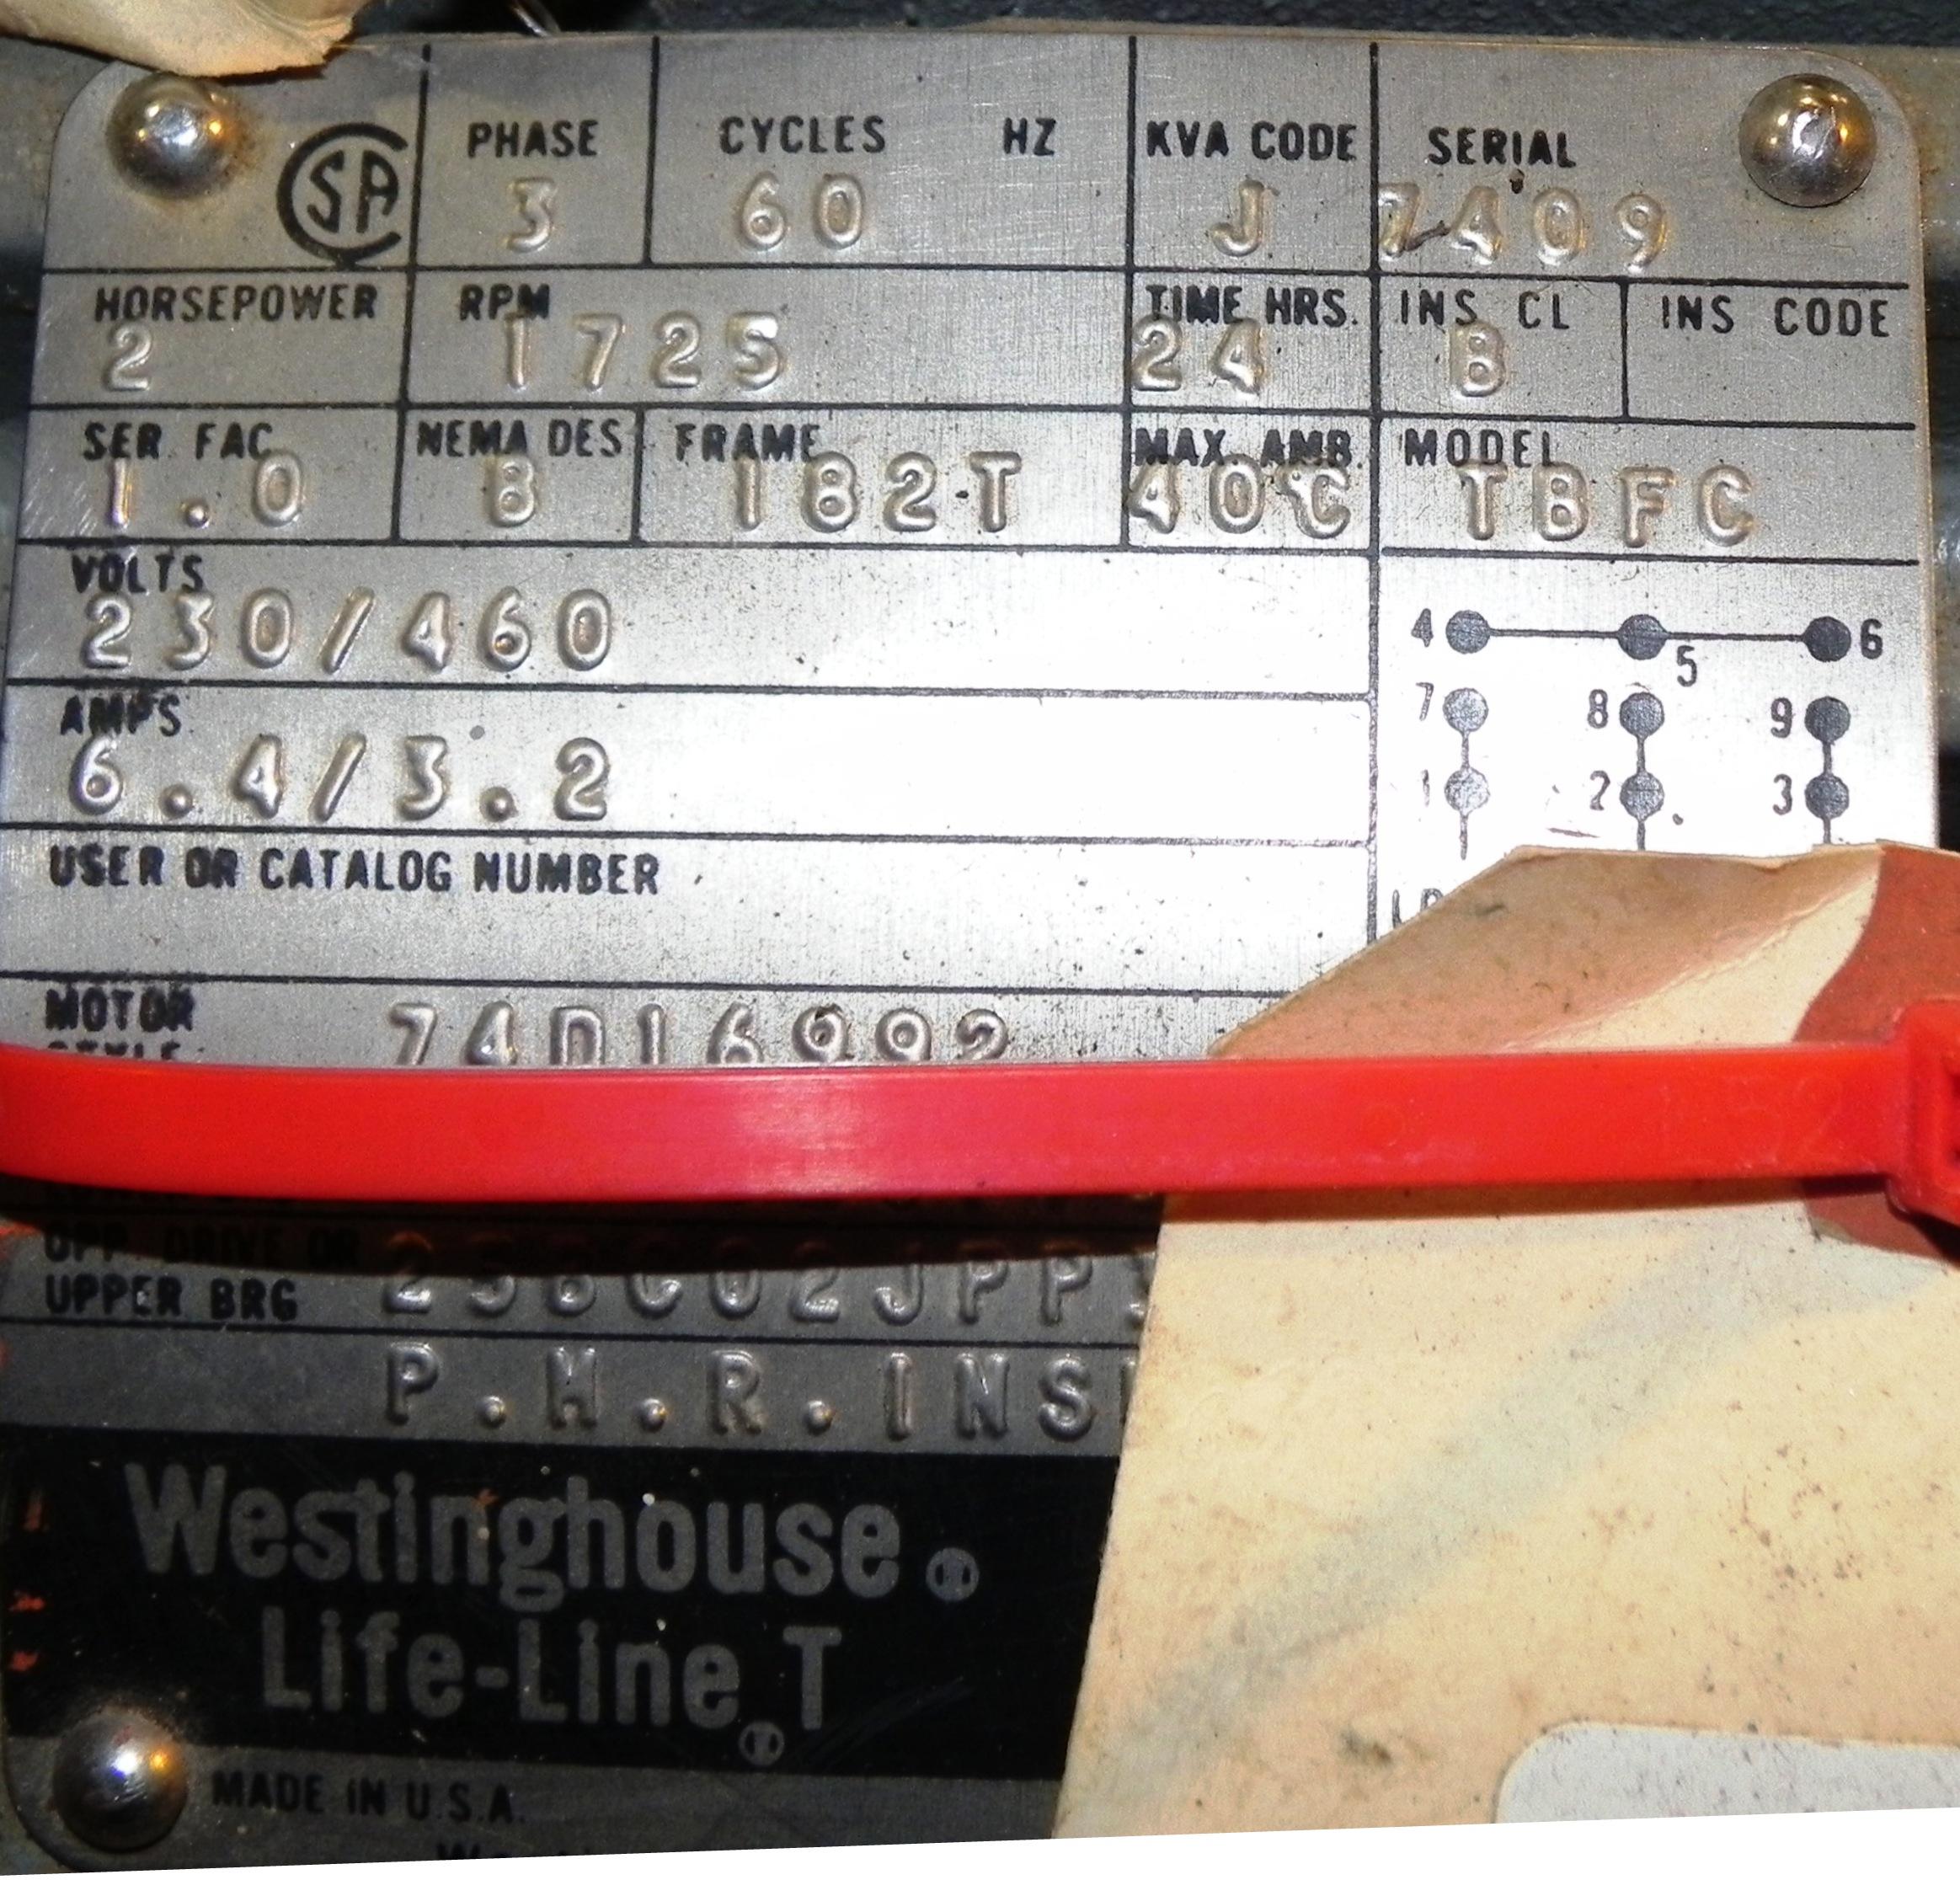 Lot 9 - Westinghouse 2 HP Life-Line T 1725 RPM Motor TBFC